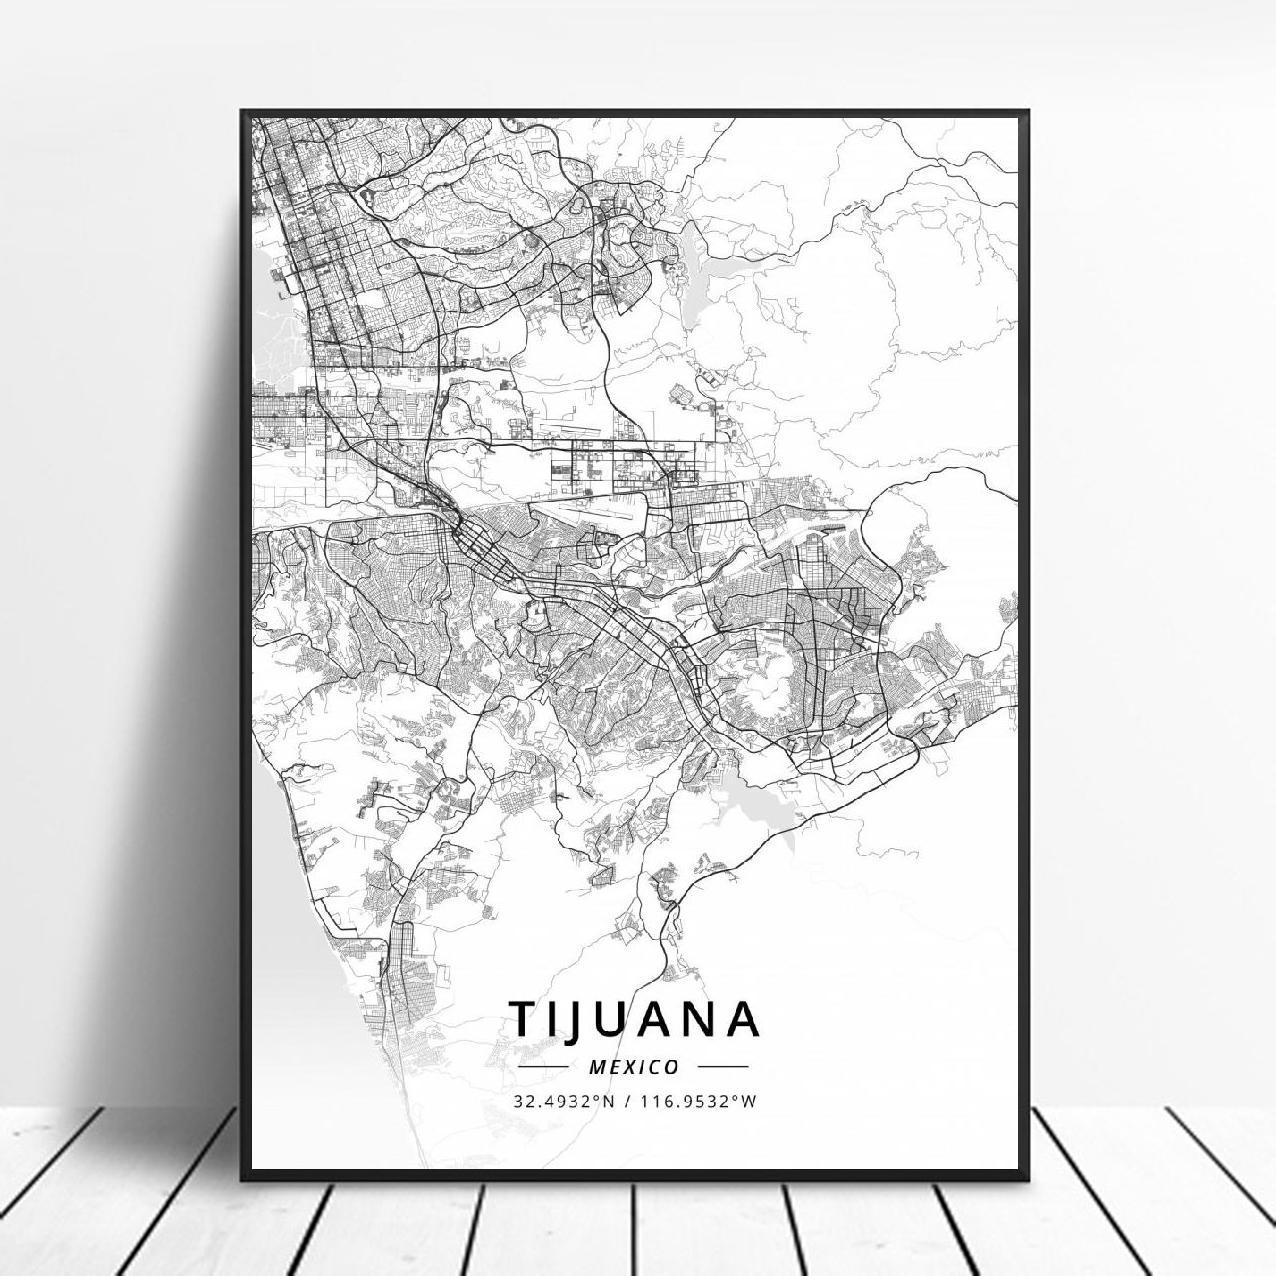 Tijuana acapulco aguascalientes durango morelia cancun méxico mapa poster